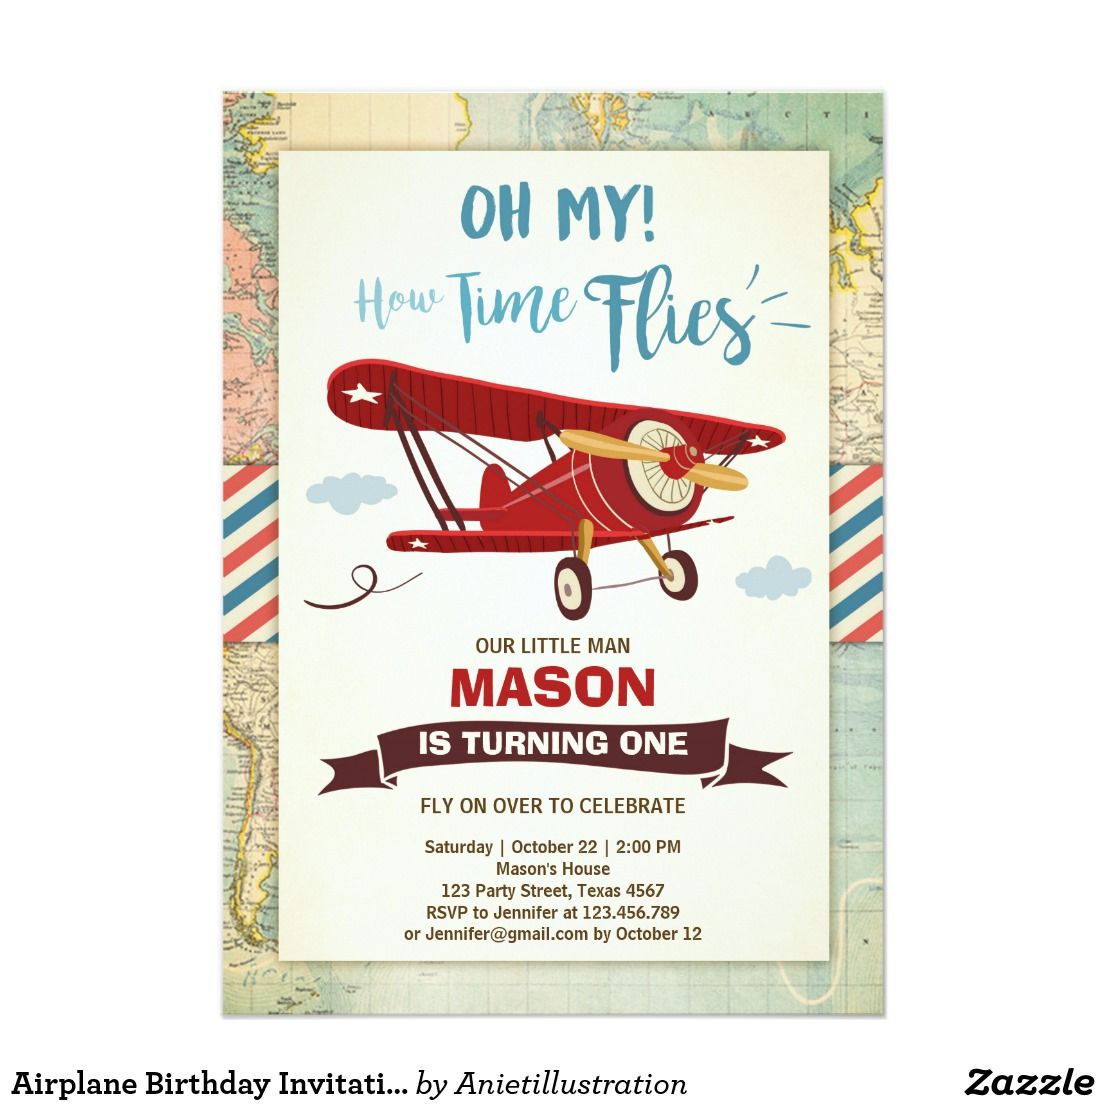 Airplane Birthday Invitation Time flies Plane Boy | Pinterest ...